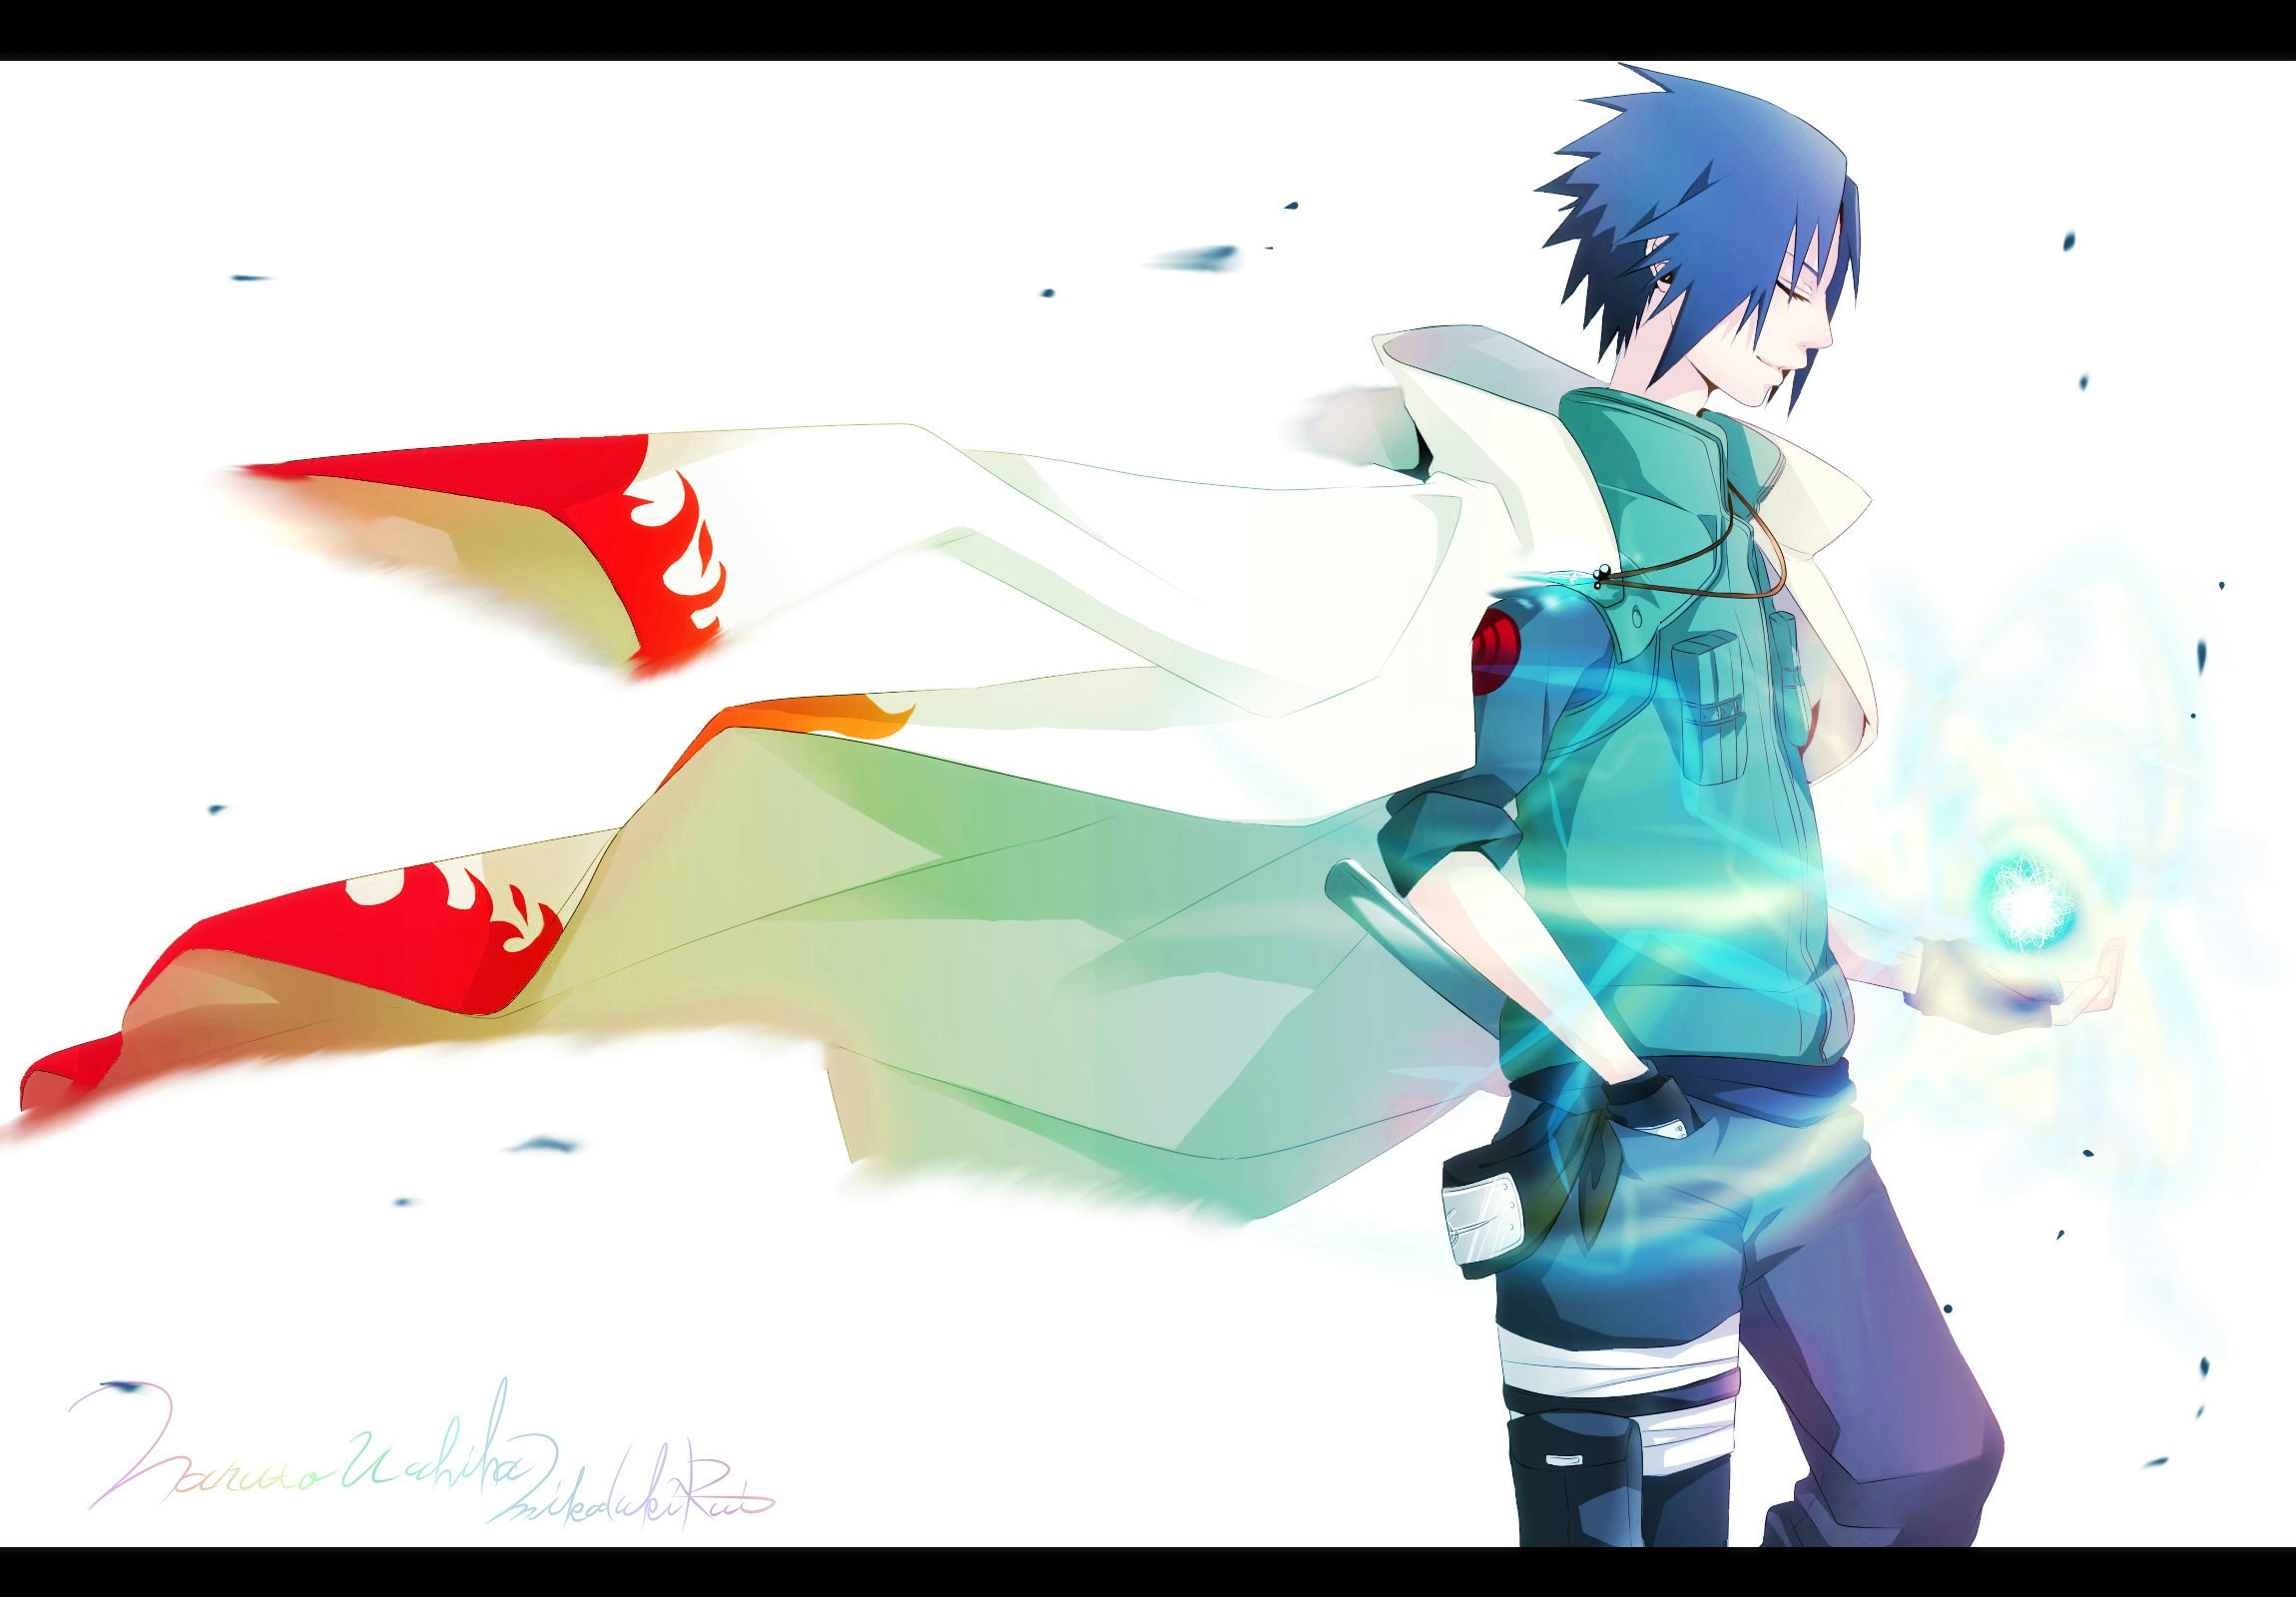 Uchiha sasuke naruto image 1202907 zerochan anime image board view fullsize uchiha sasuke image voltagebd Images